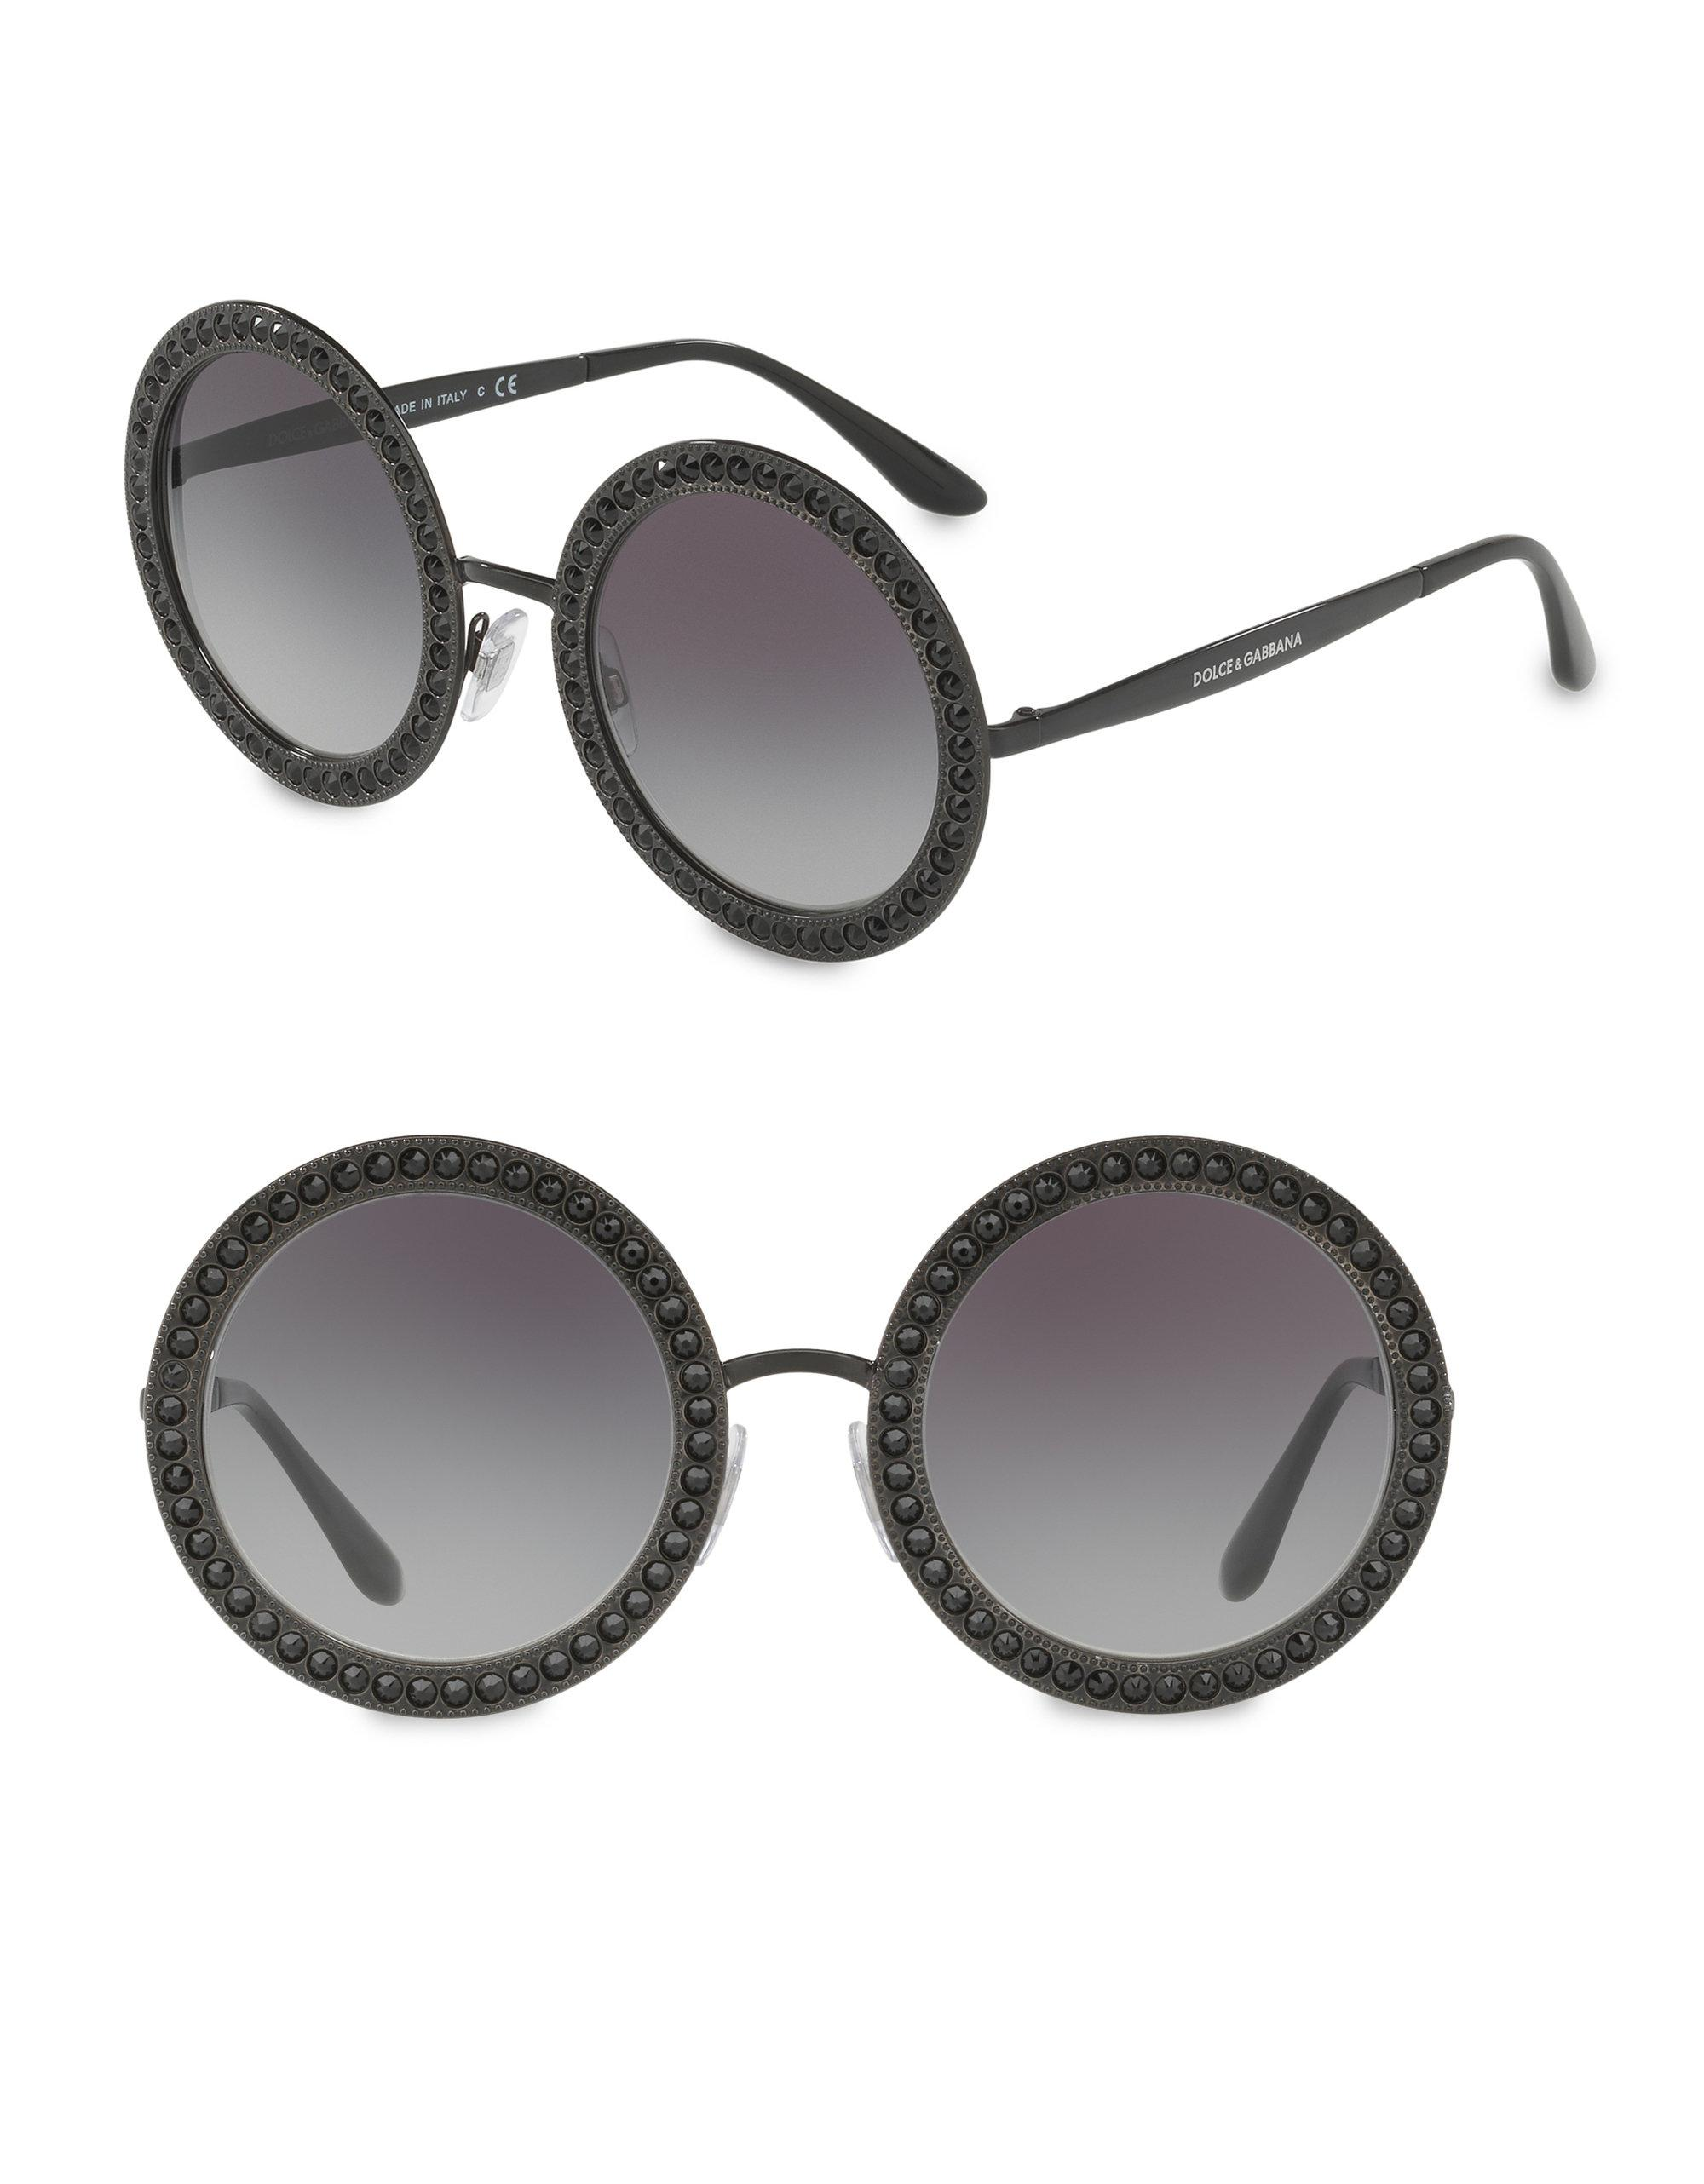 3a65f9d360b9 Sunglasses amp; Lyst 51mm In Round Crystal Trim Dolce Gabbana Black AUU7w1